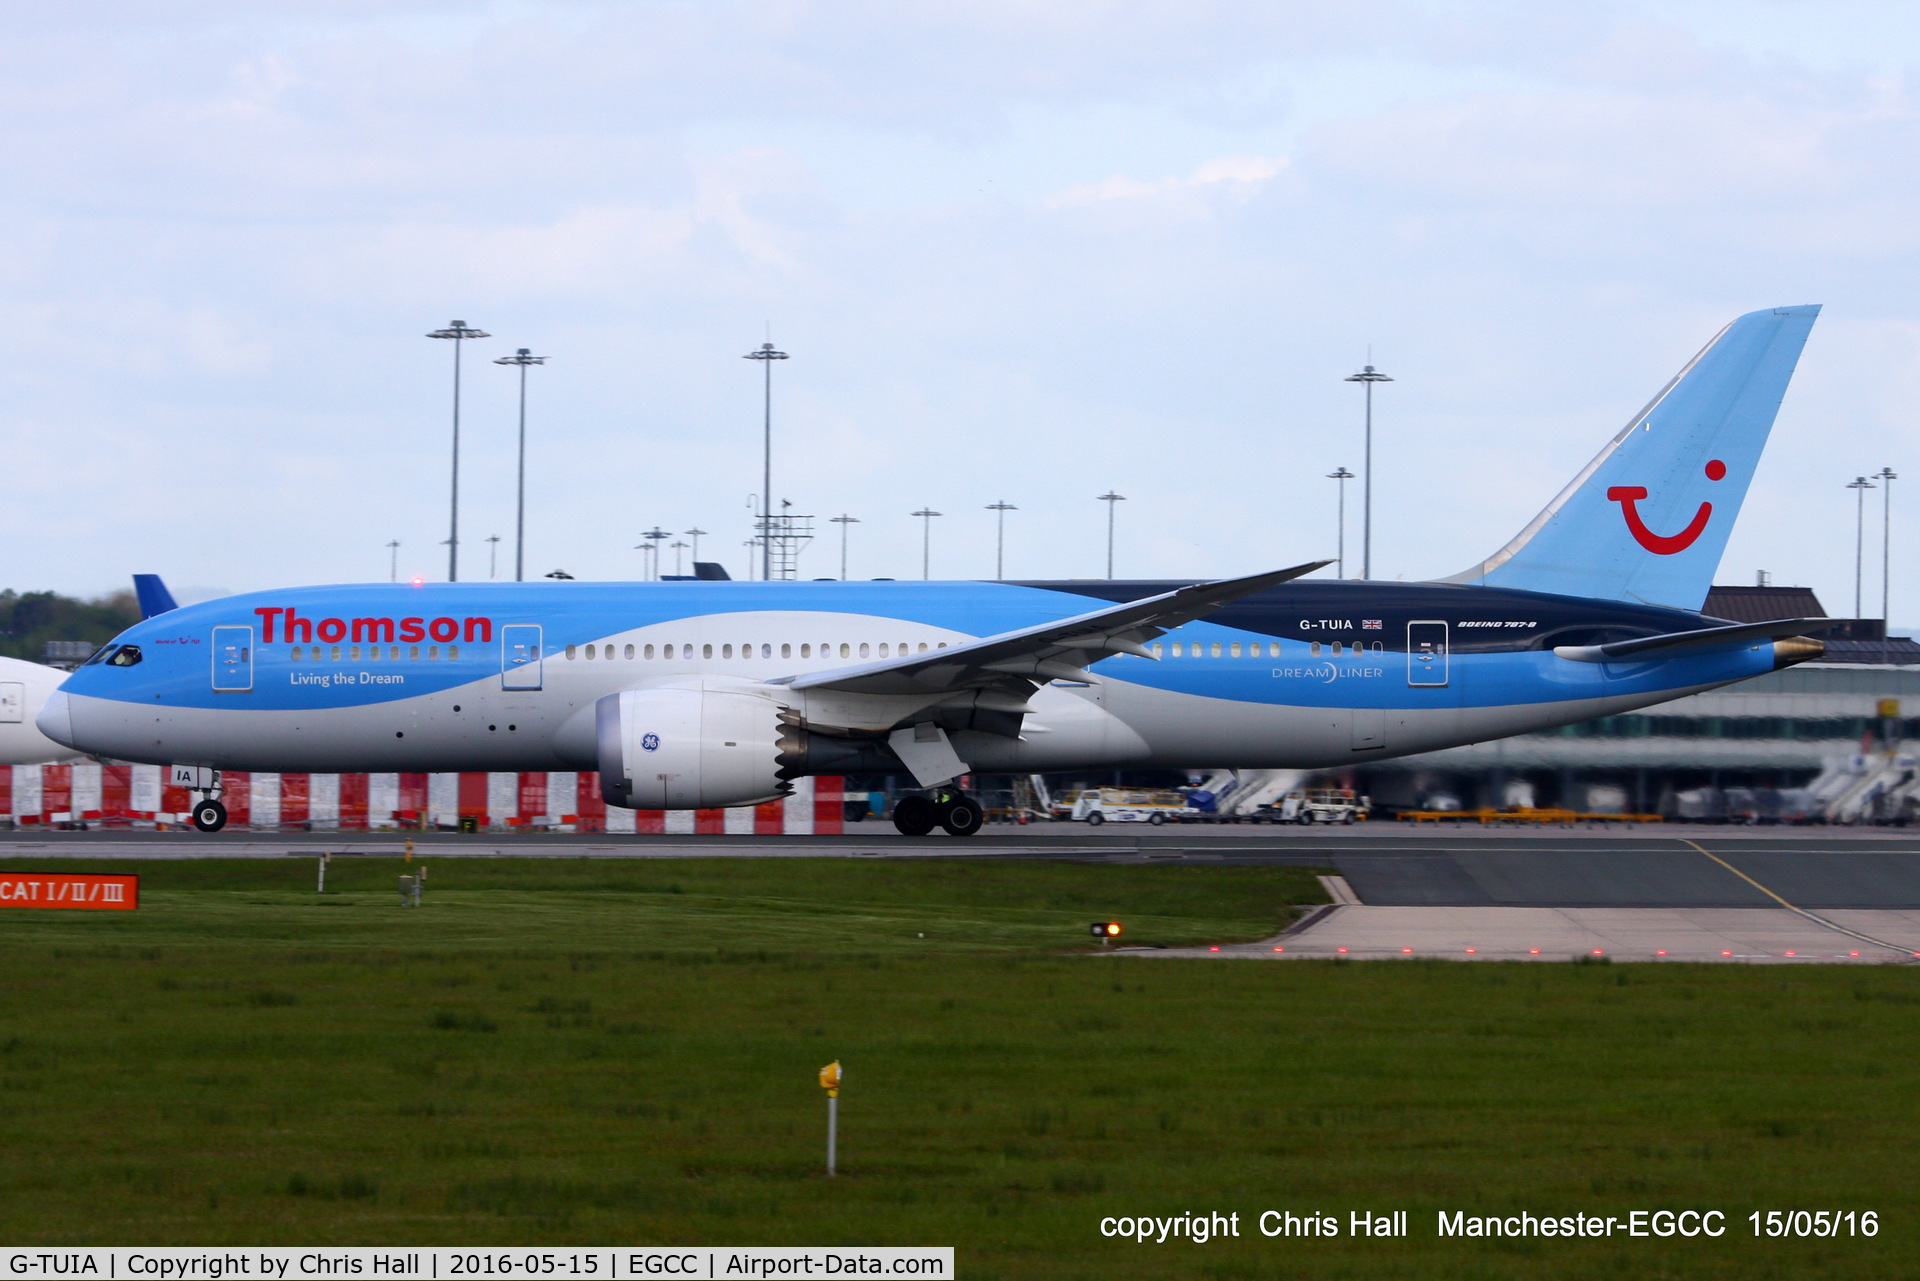 G-TUIA, 2013 Boeing 787-8 Dreamliner C/N 34422, Thomson